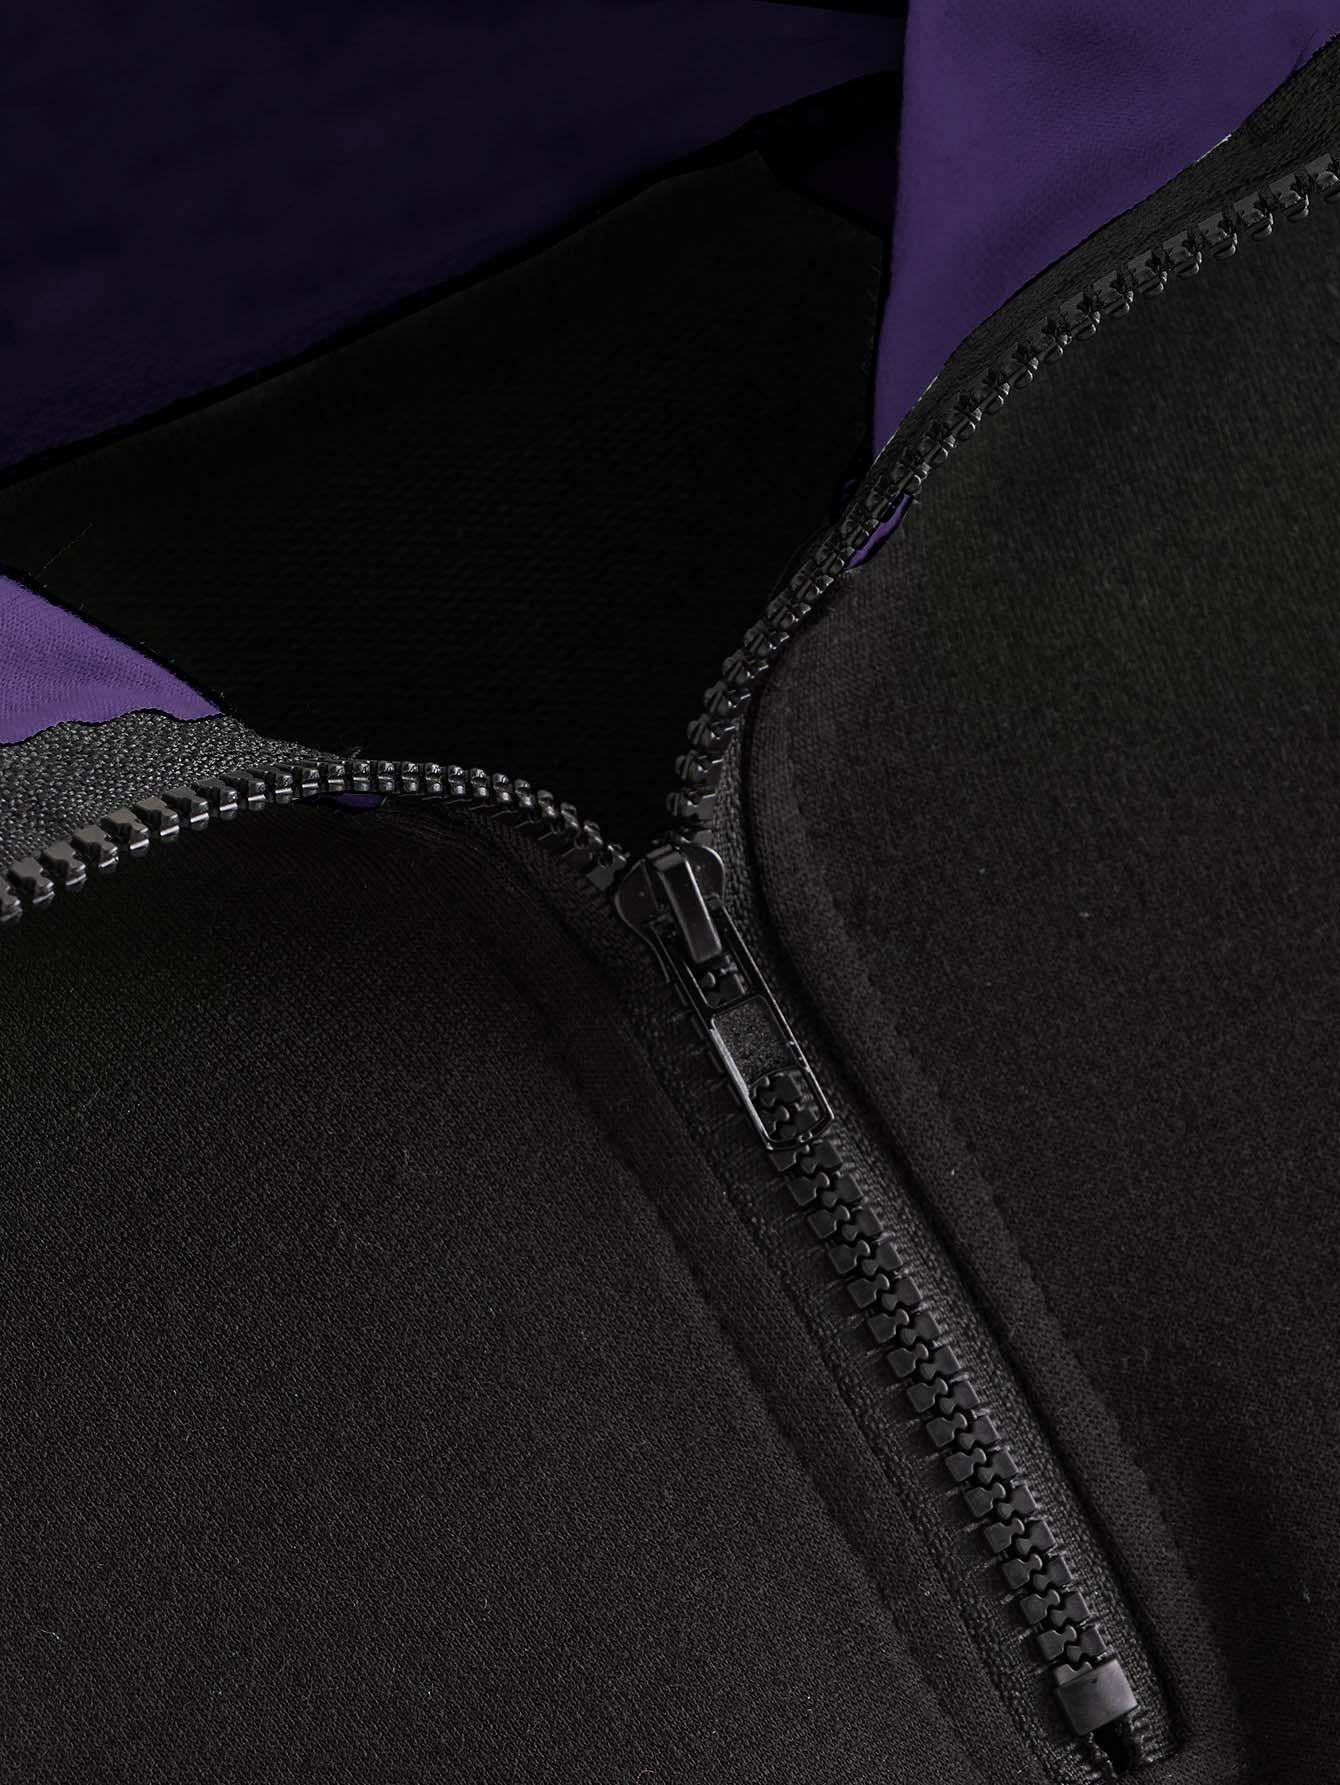 Stand Collar Contrast Panel Half Placket Sweatshirt Sponsored